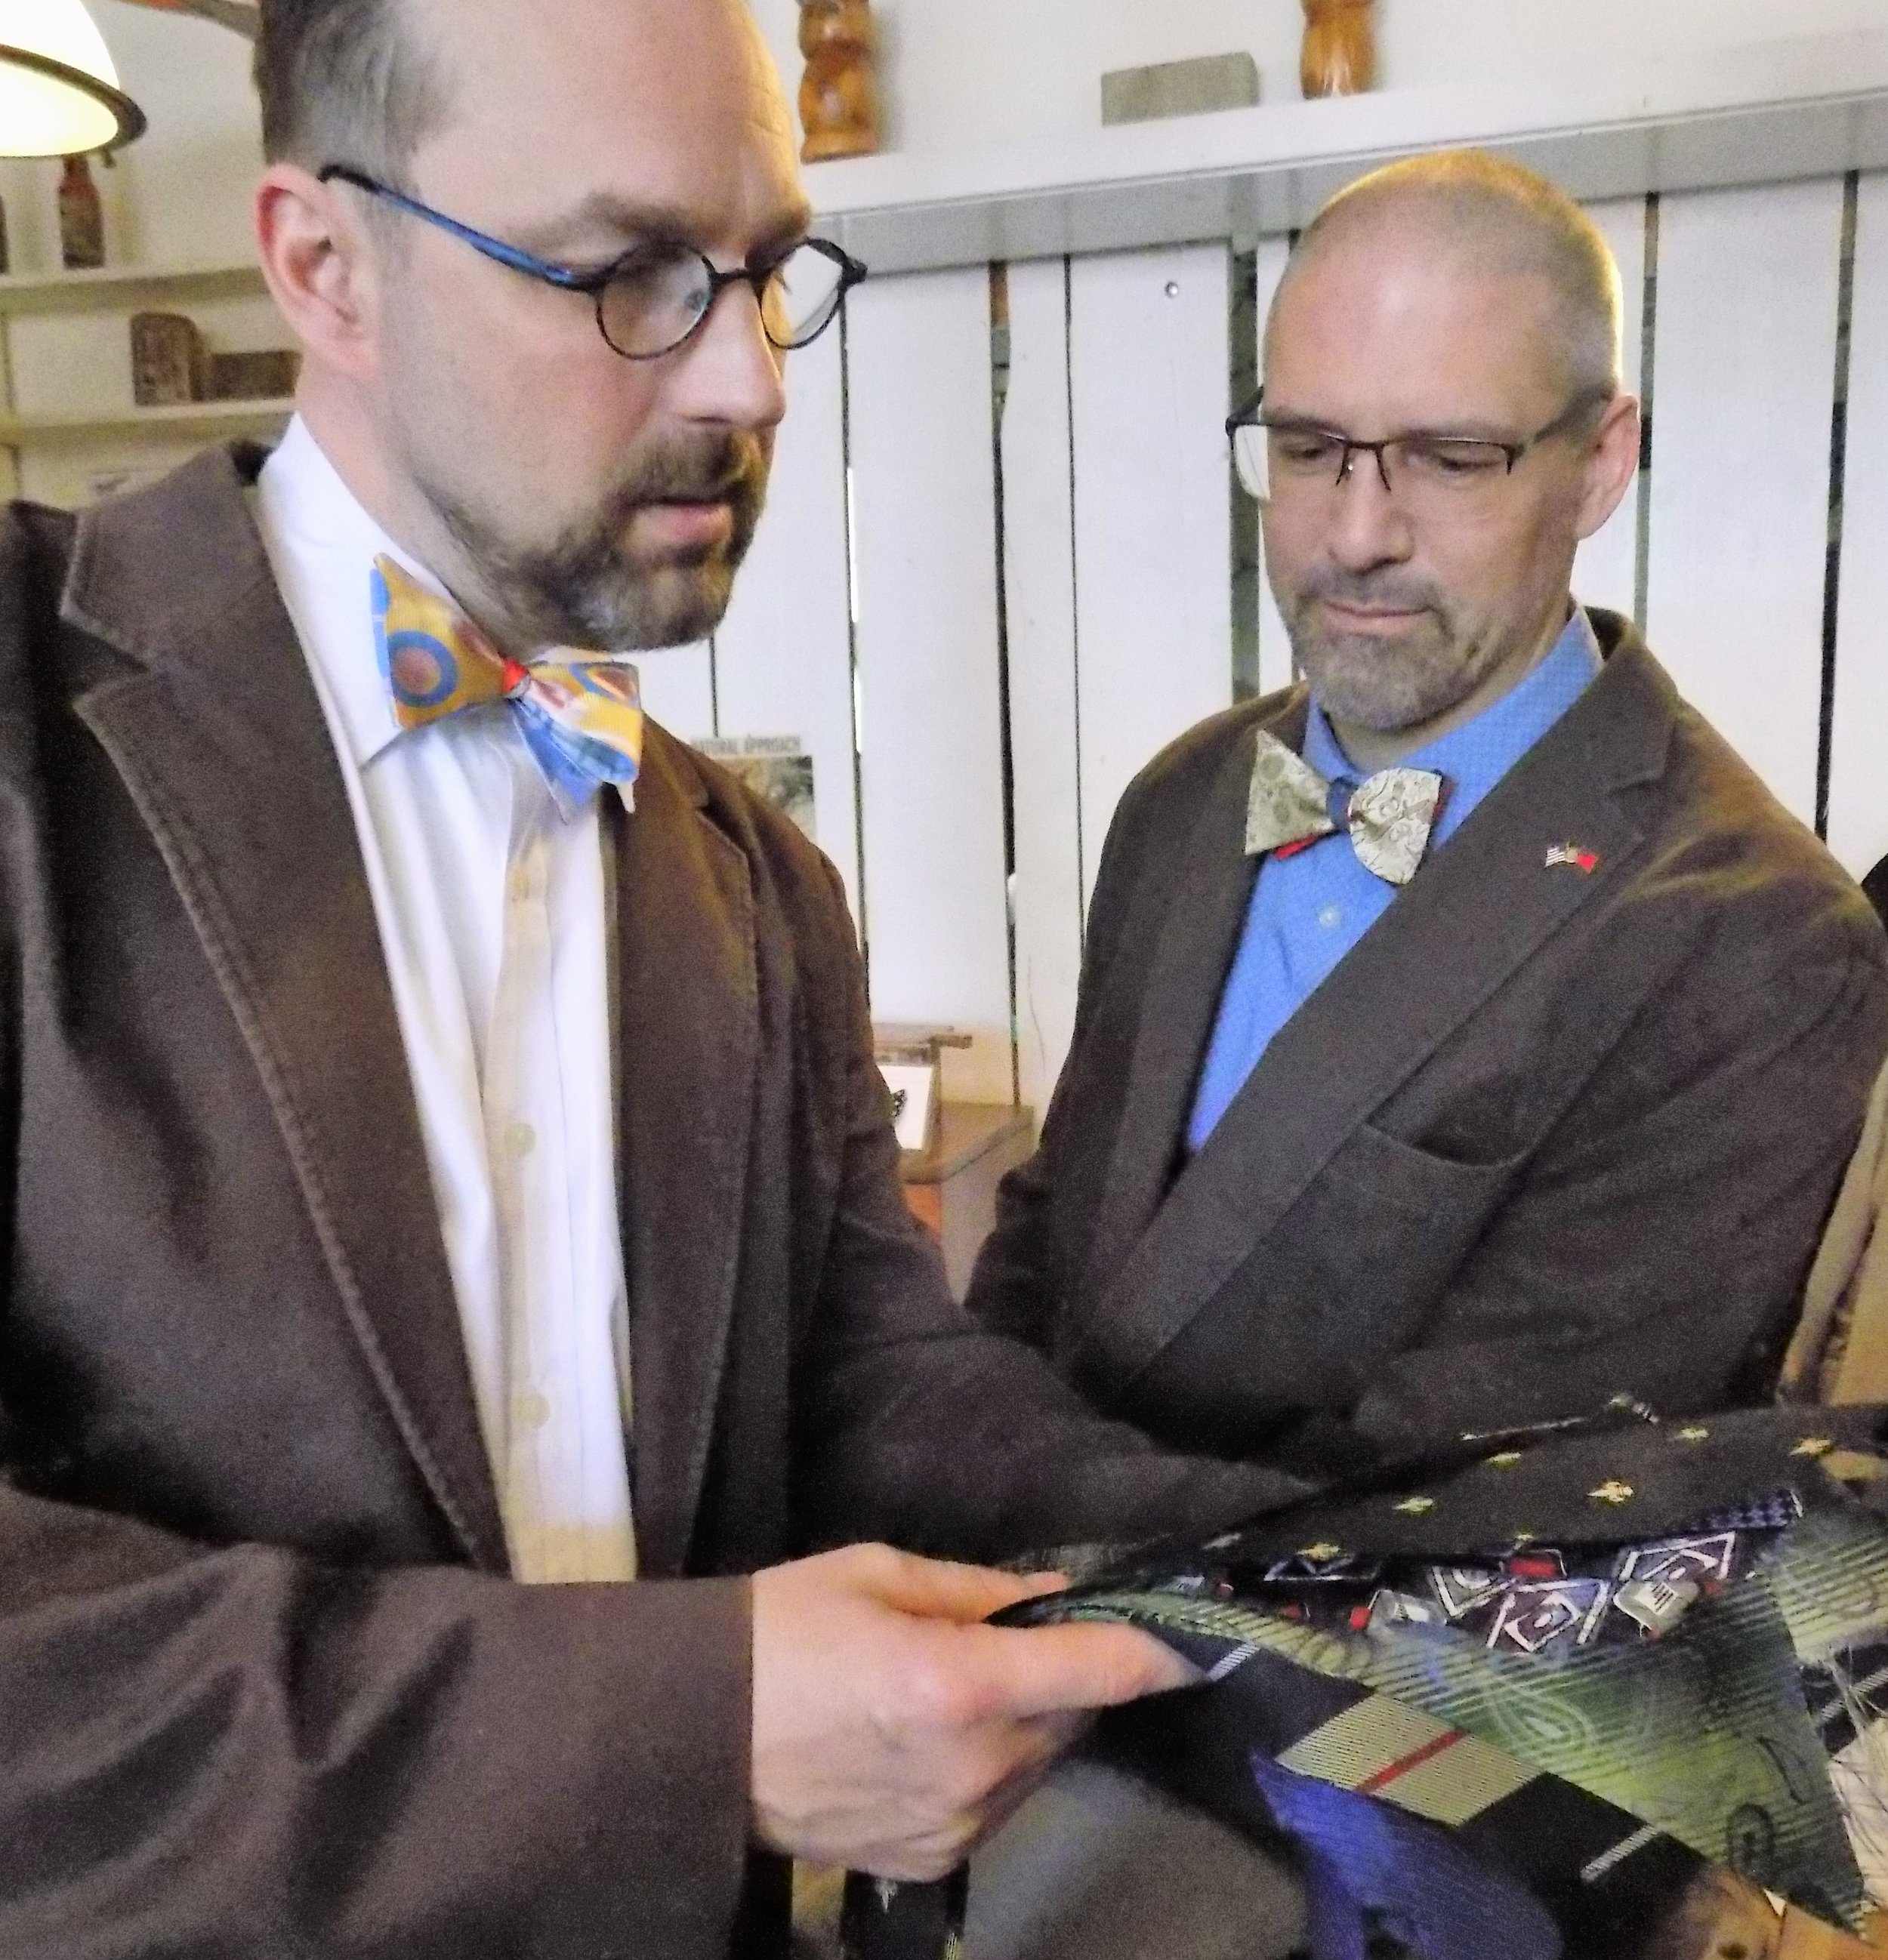 Michael beam and Duke Adams Vagabond LLC, us@vagabondbowties.com  (2).JPG